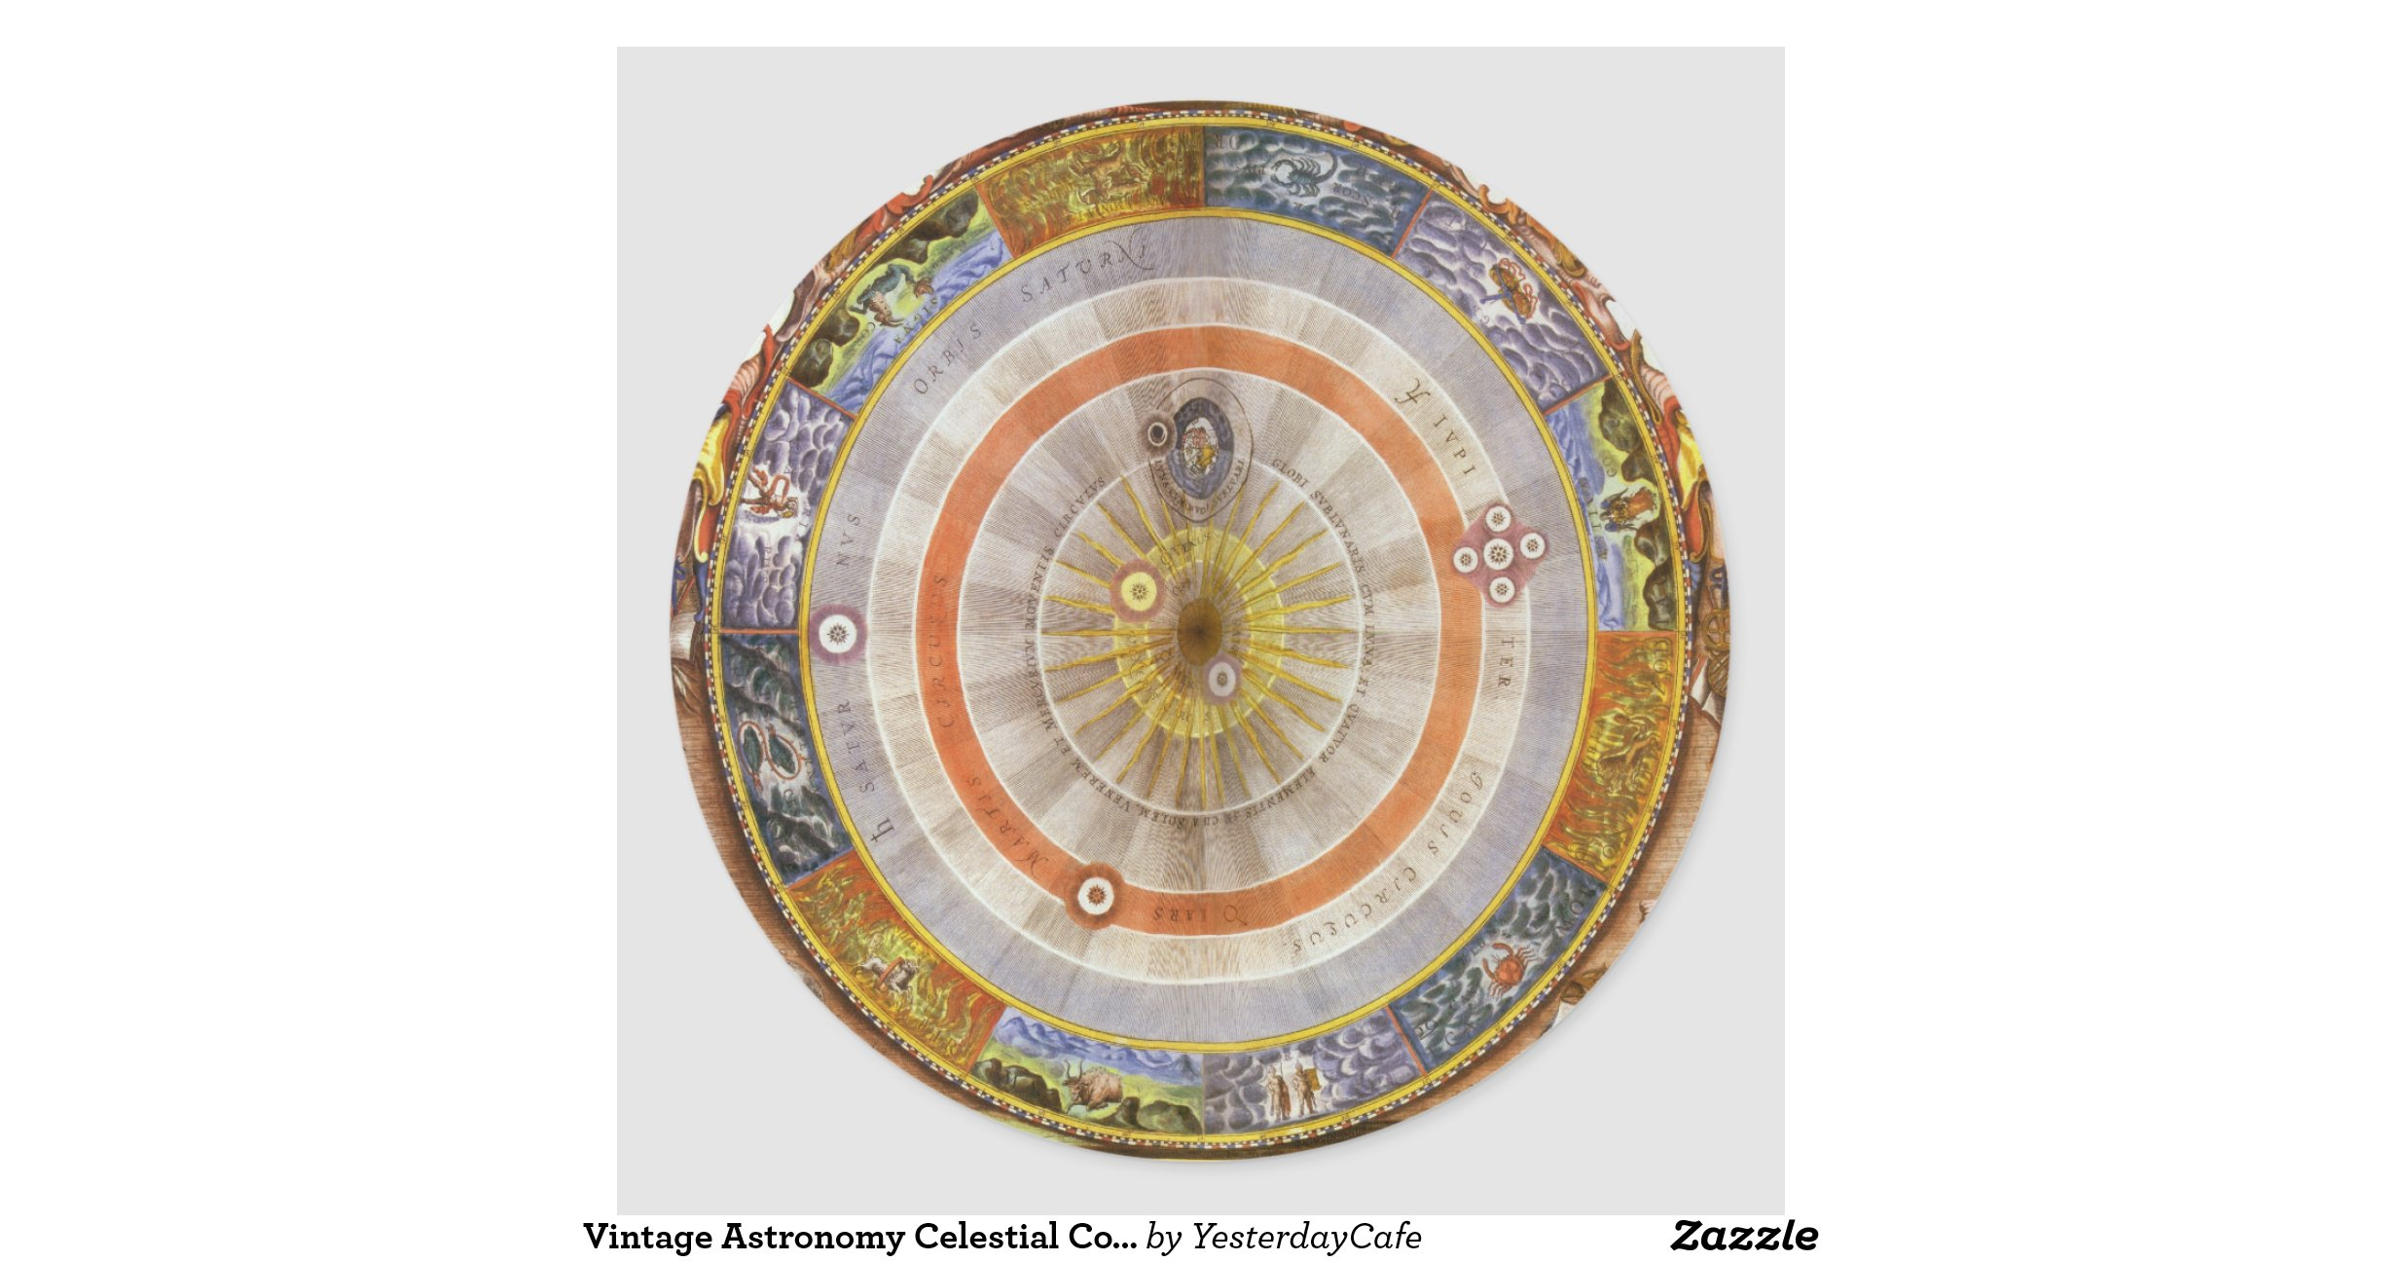 vintage astronomy celestial copernican planisphere round sticker zazzle. Black Bedroom Furniture Sets. Home Design Ideas